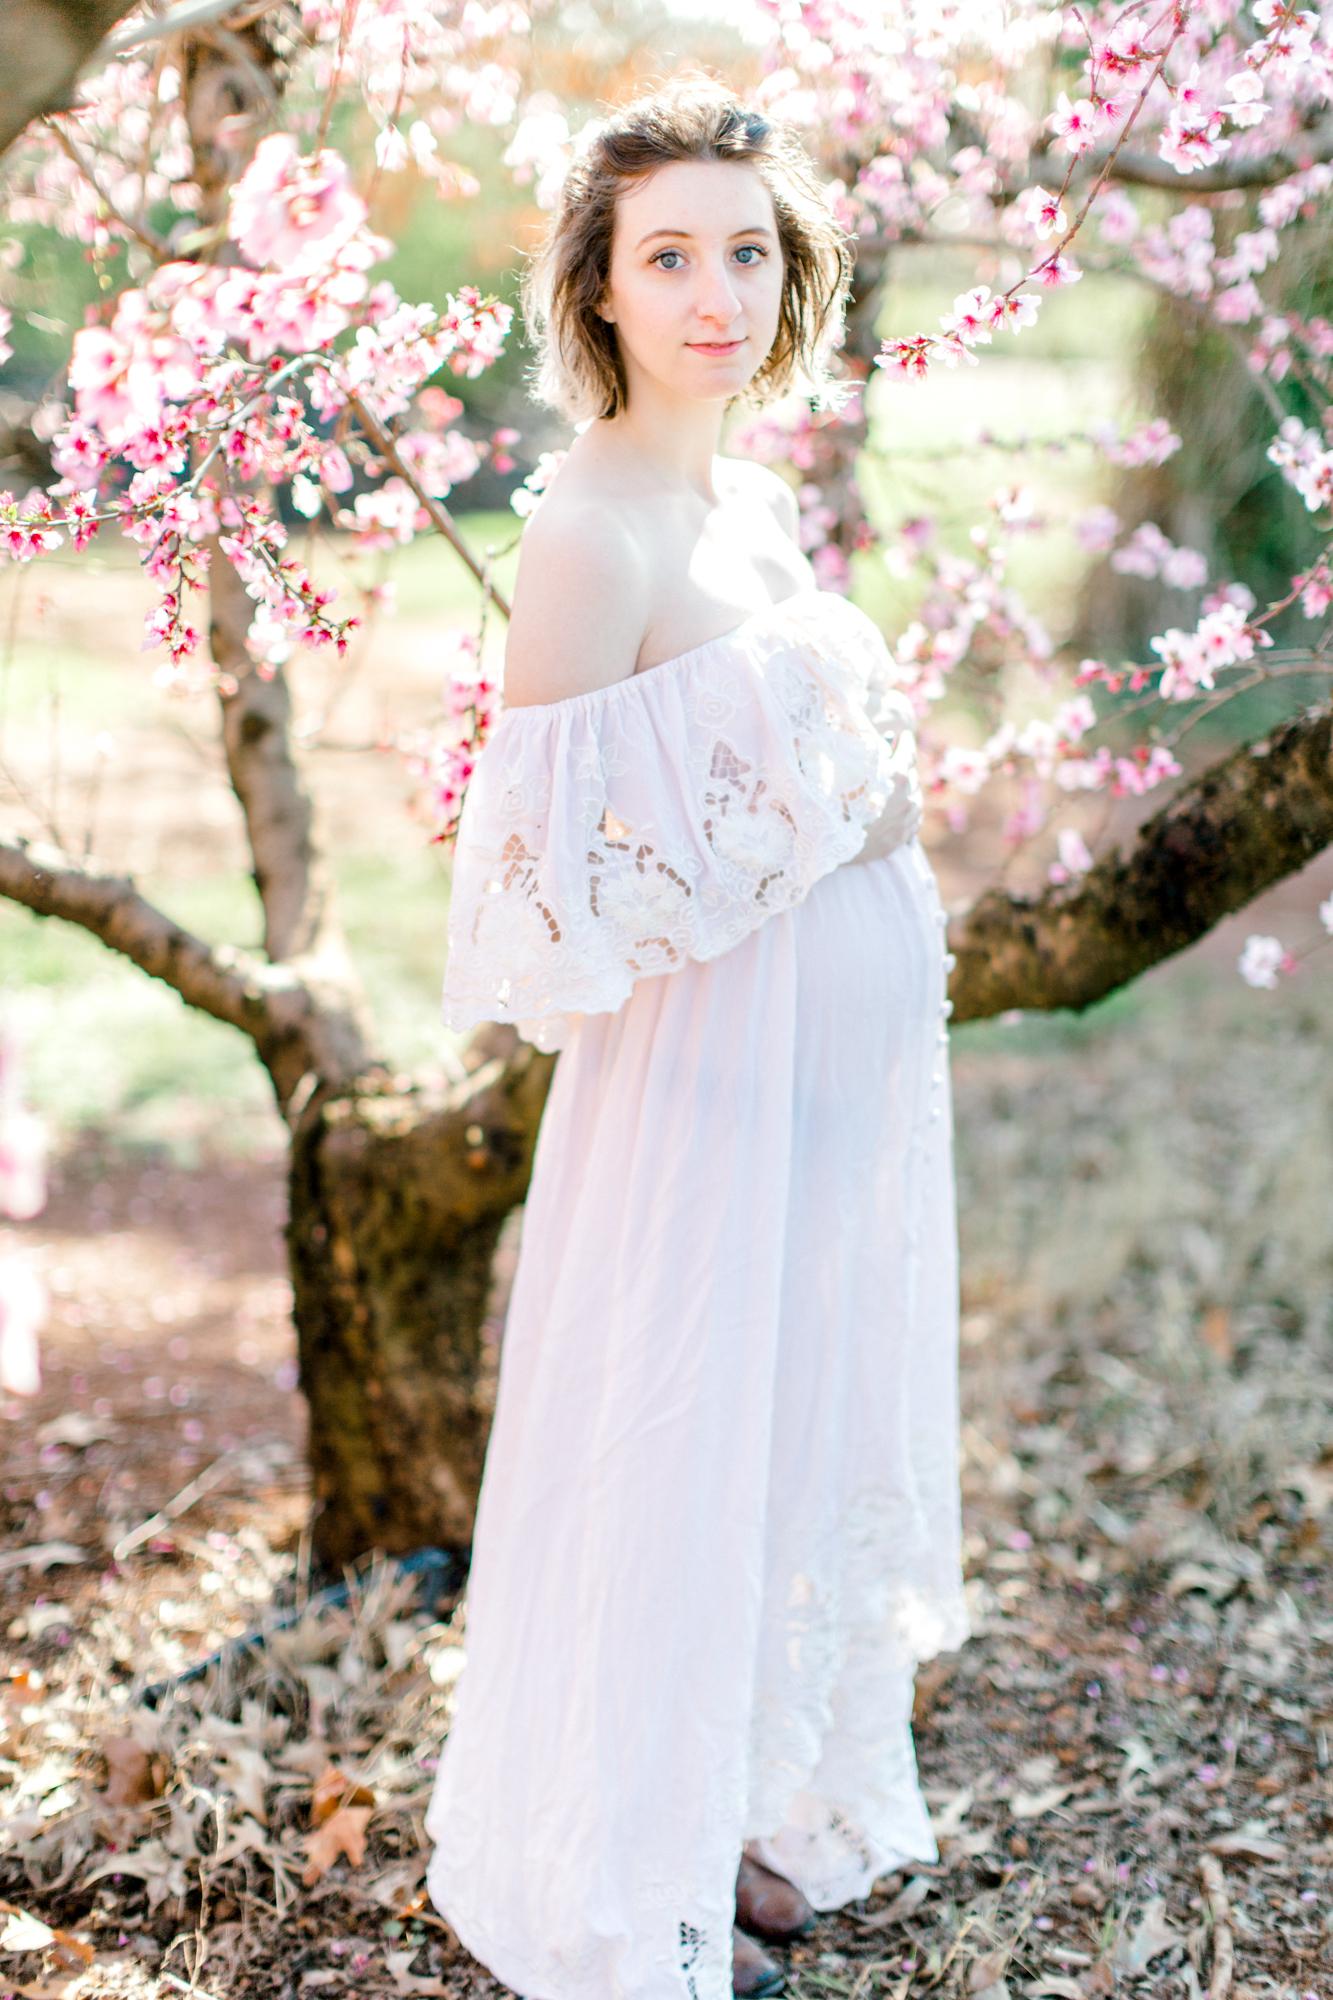 four corners photography peach blossom mini sessions peach blossom maternity session (21 of 25).jpg